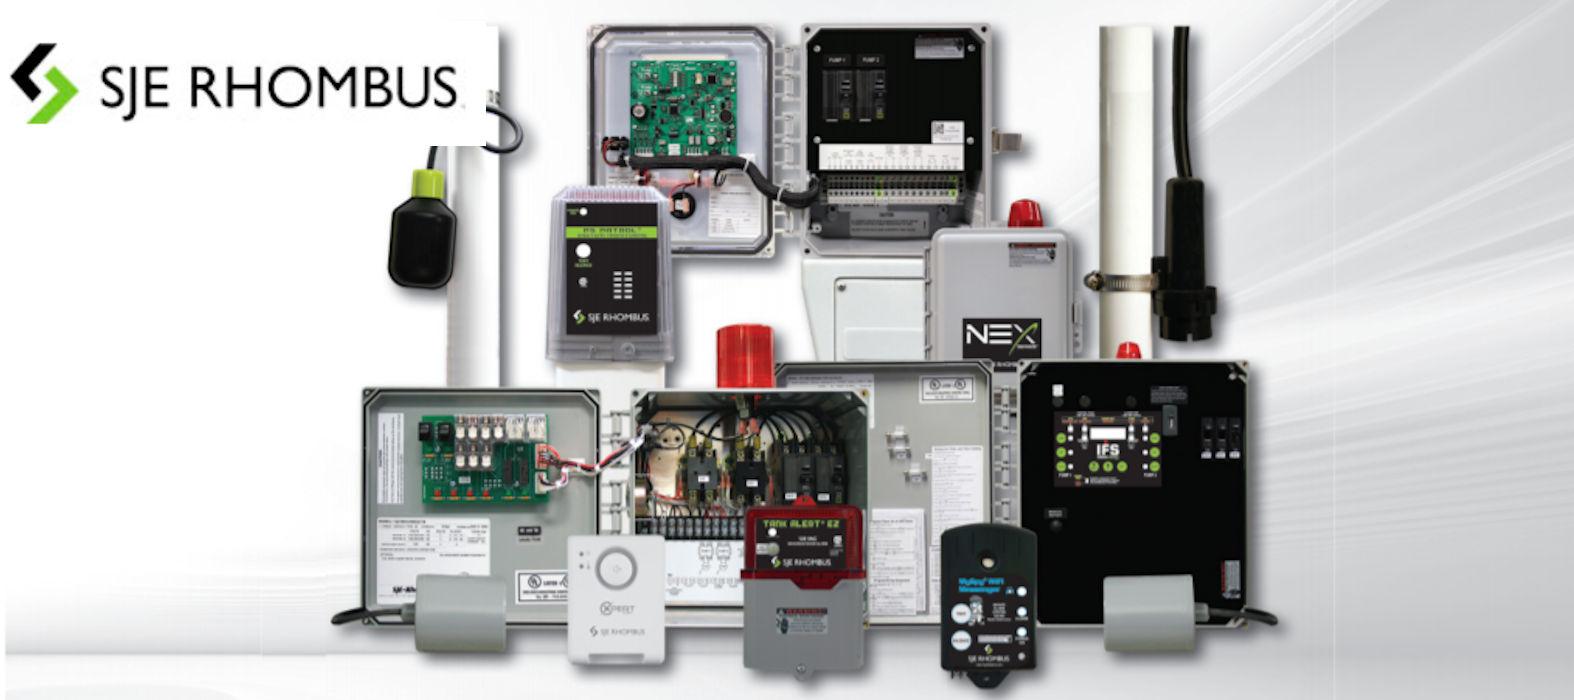 SJE_Rhombus_float_switch_alarm_control_panel